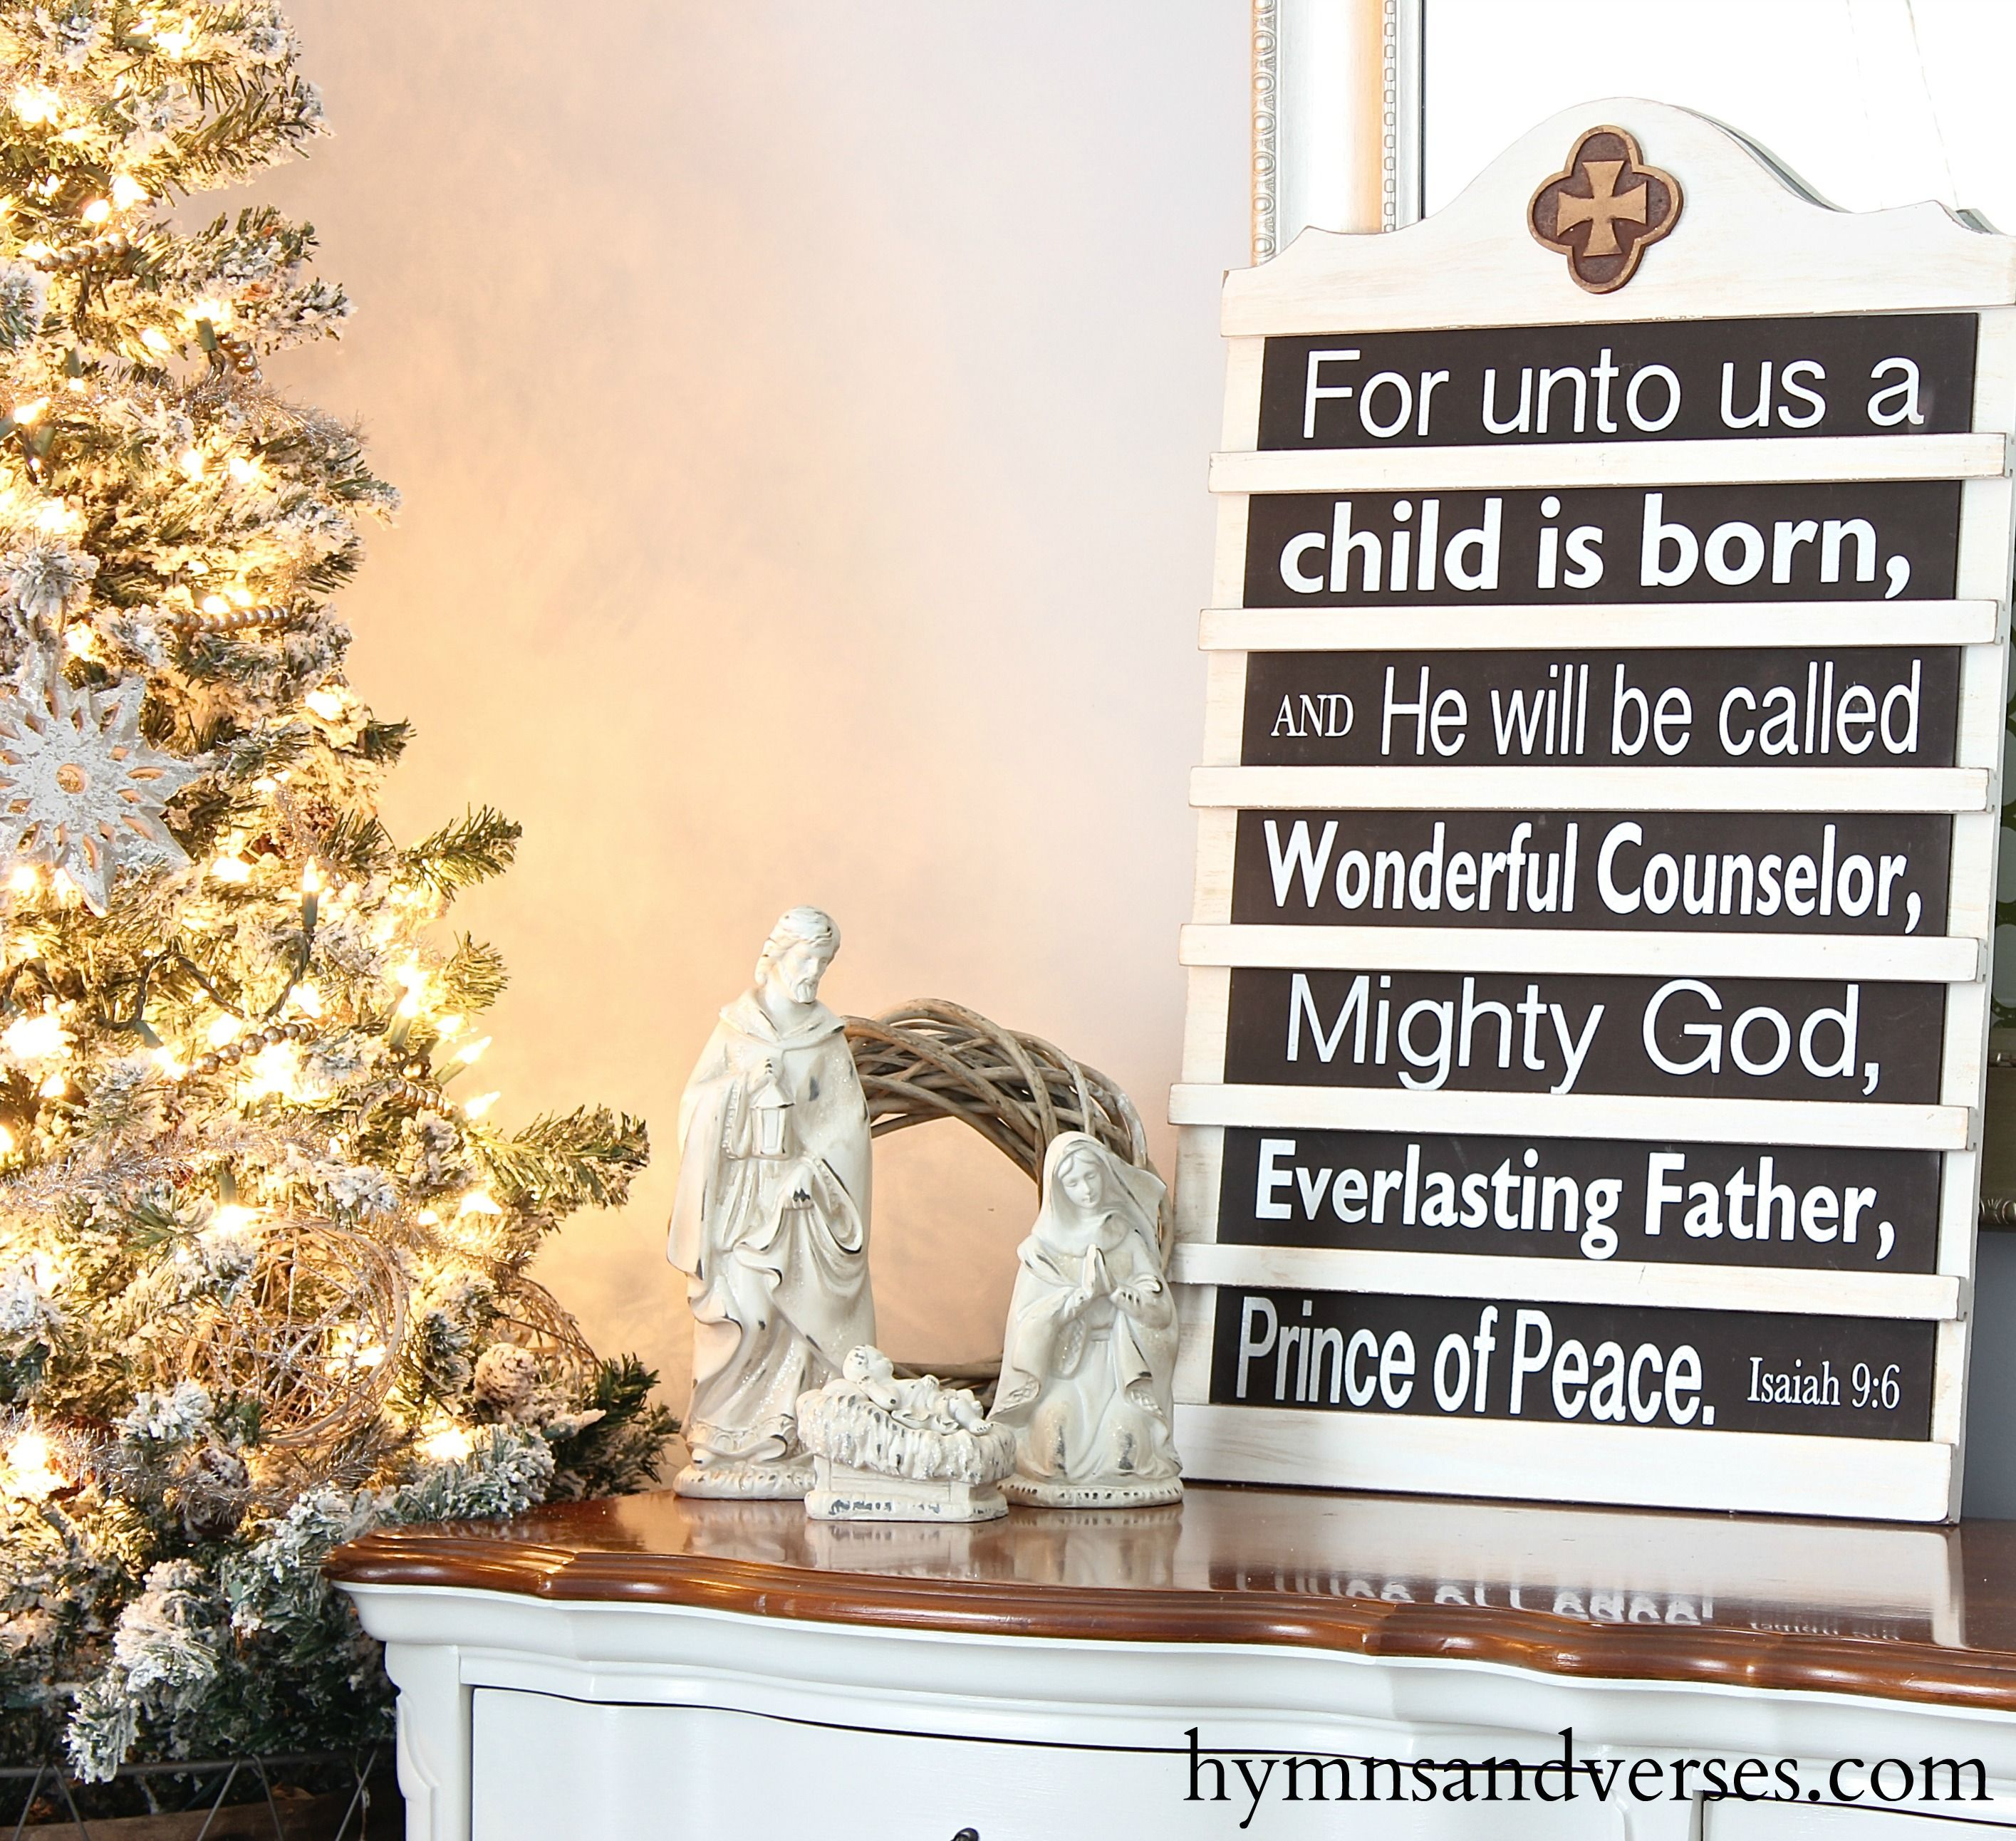 2015 hymns  verses holiday home tour  mary martha